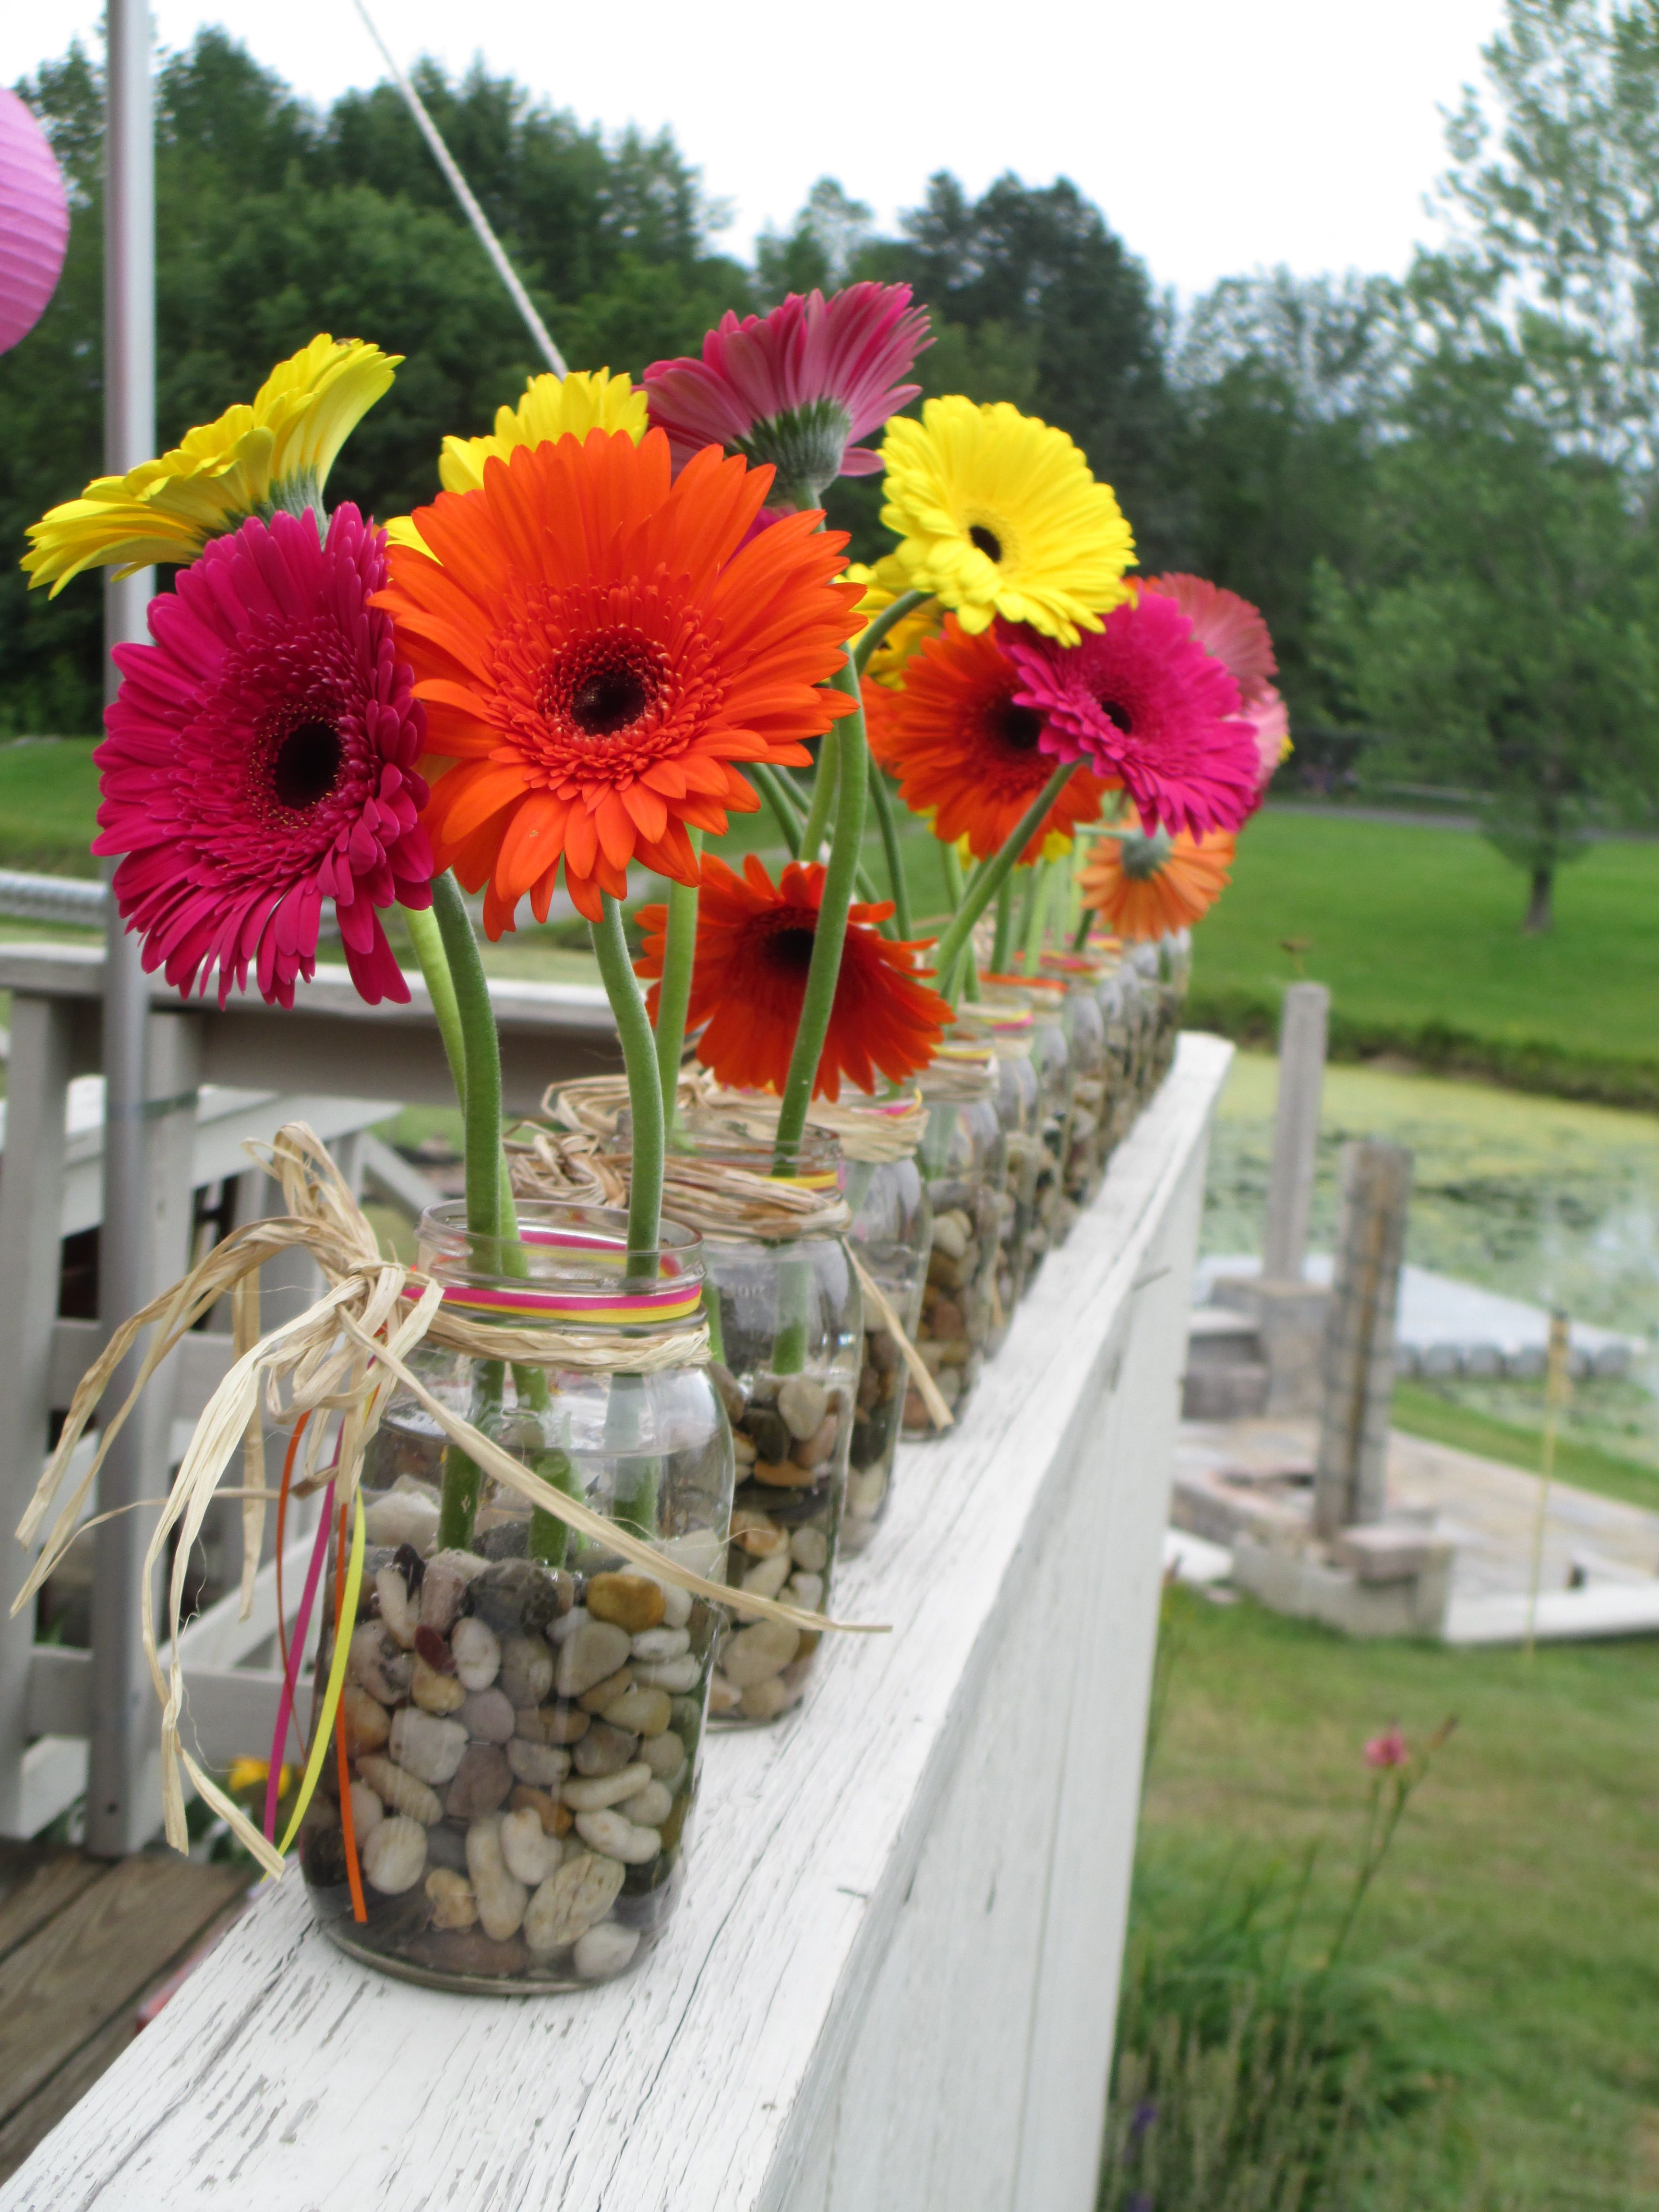 Gorgeous gerbera daisies in a simple mason jar for a beautiful touch gorgeous gerbera daisies in a simple mason jar for a beautiful touch to my party centerpiece flowers izmirmasajfo